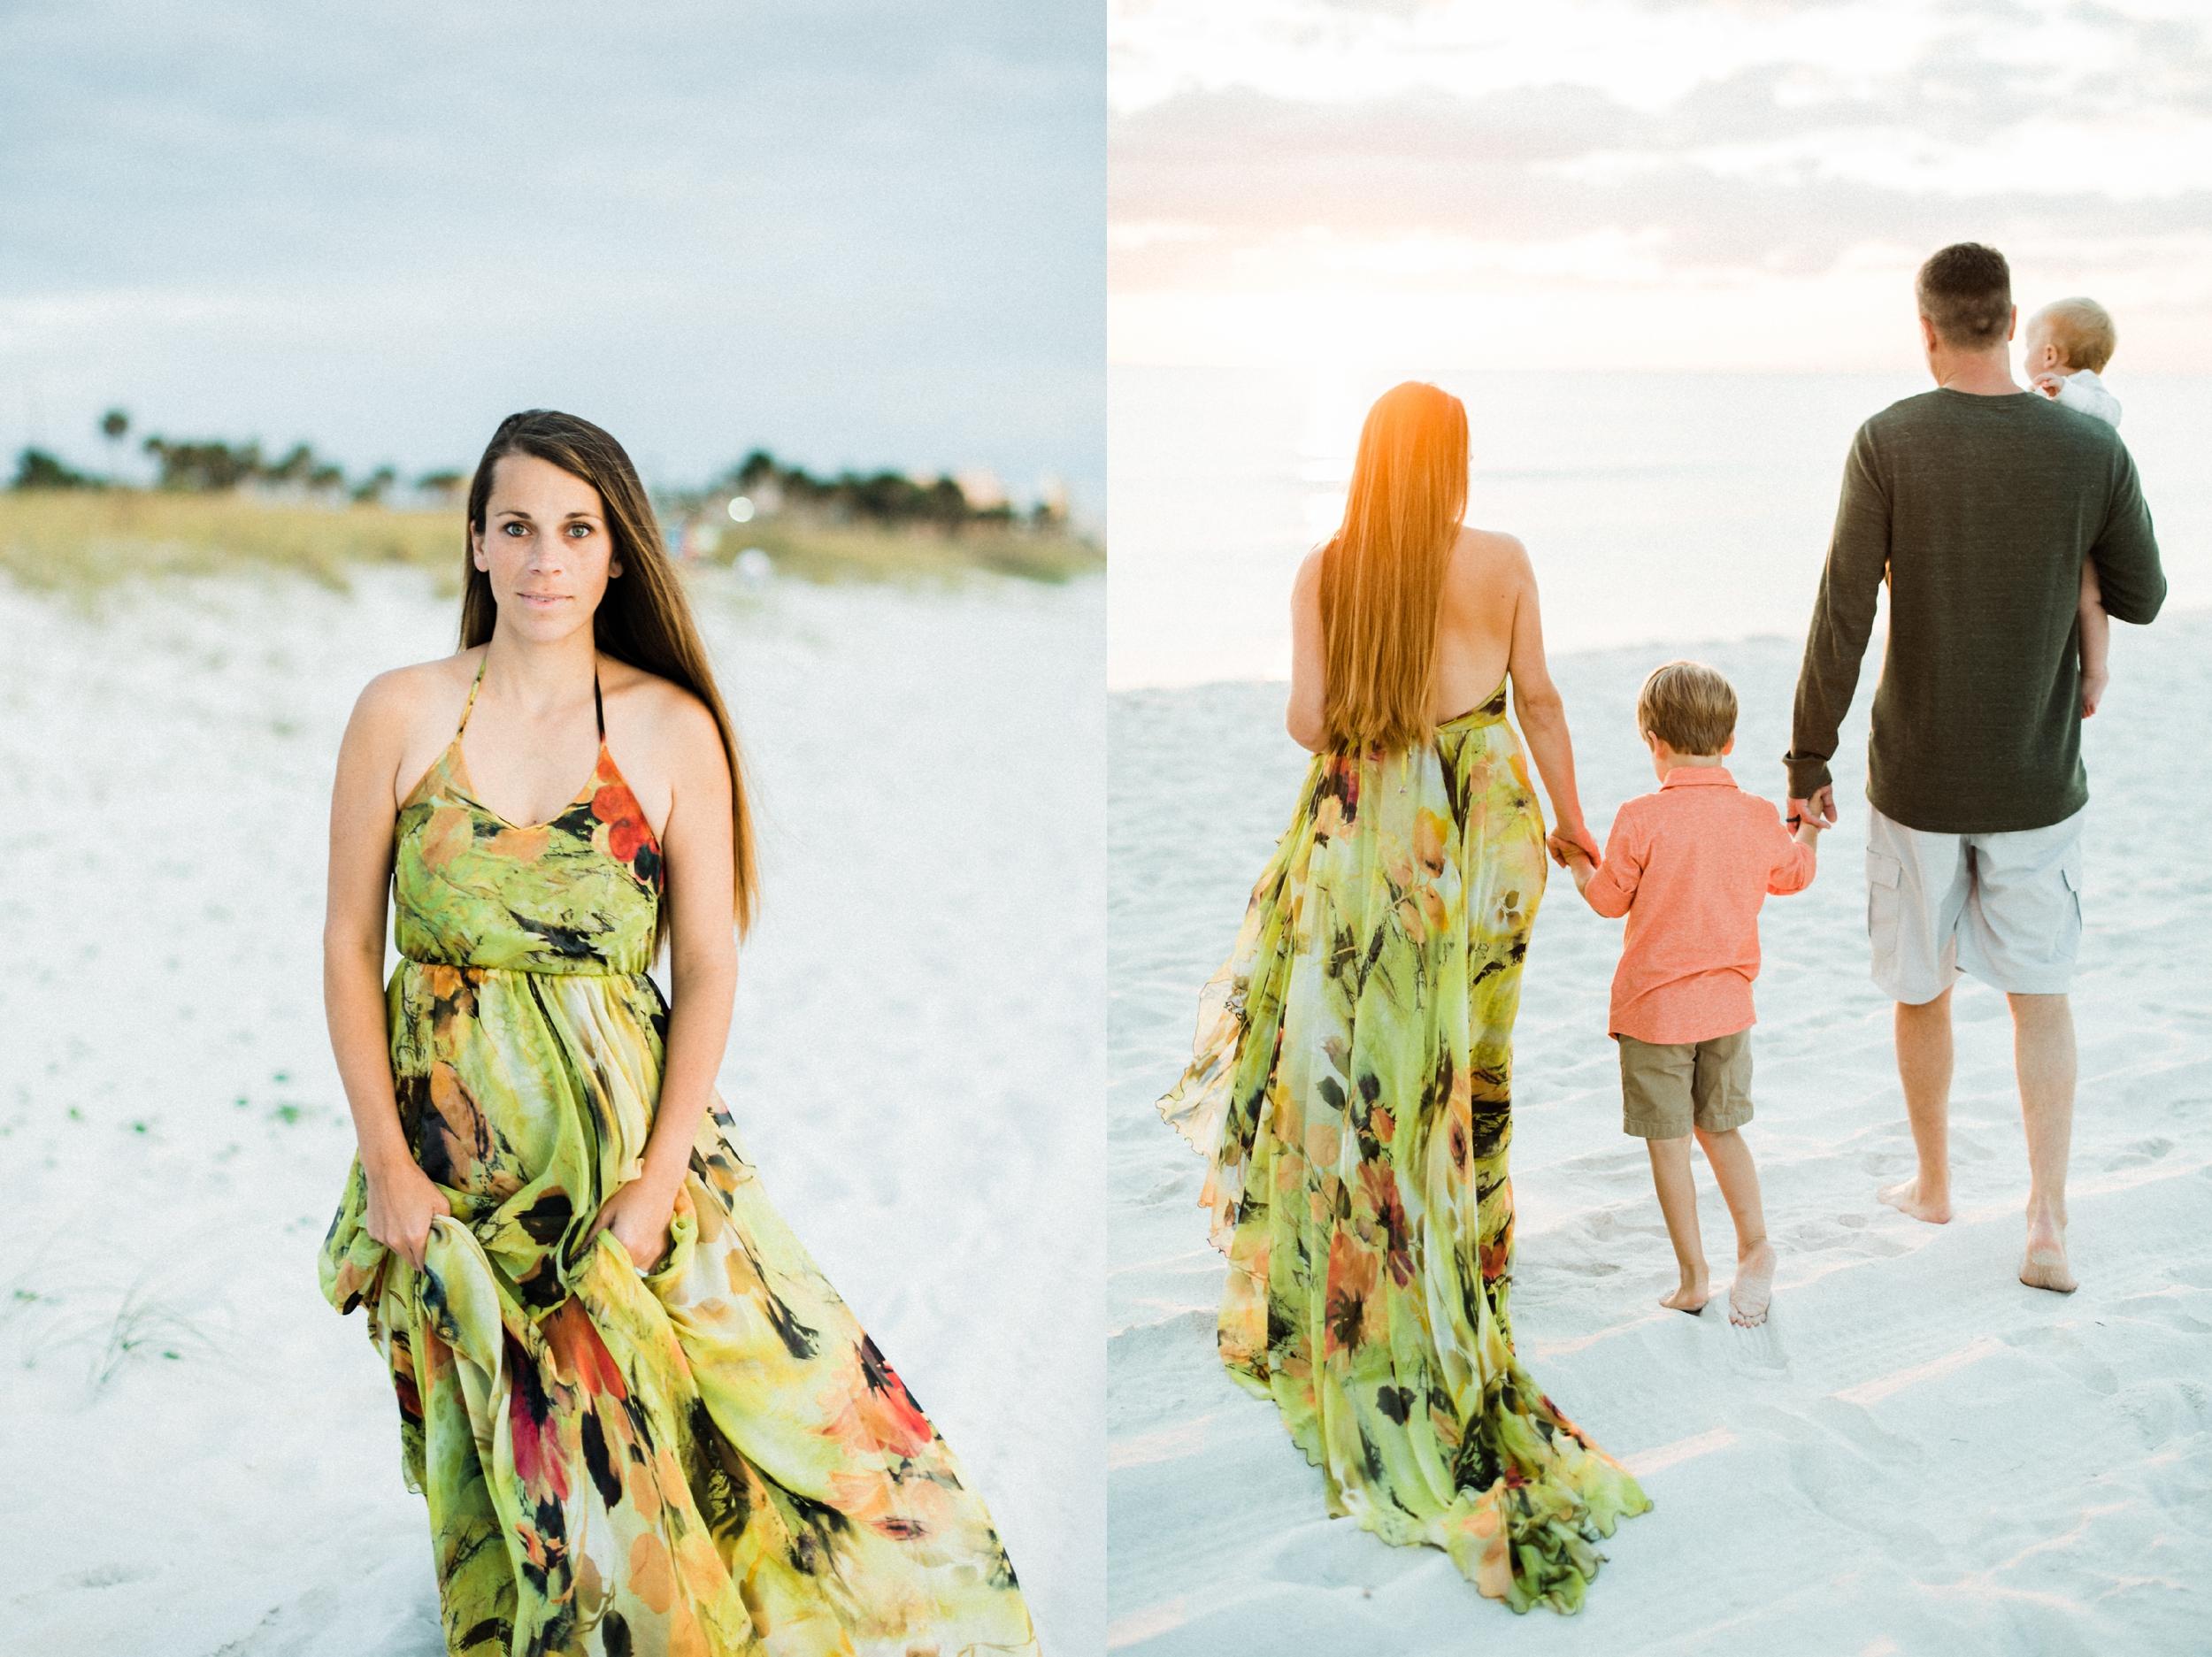 desiree-gardner-photography-pairs-france-monet-garden-monets-couple-wedding-engagement-giverny-30-a-30a-florida_0080.jpg